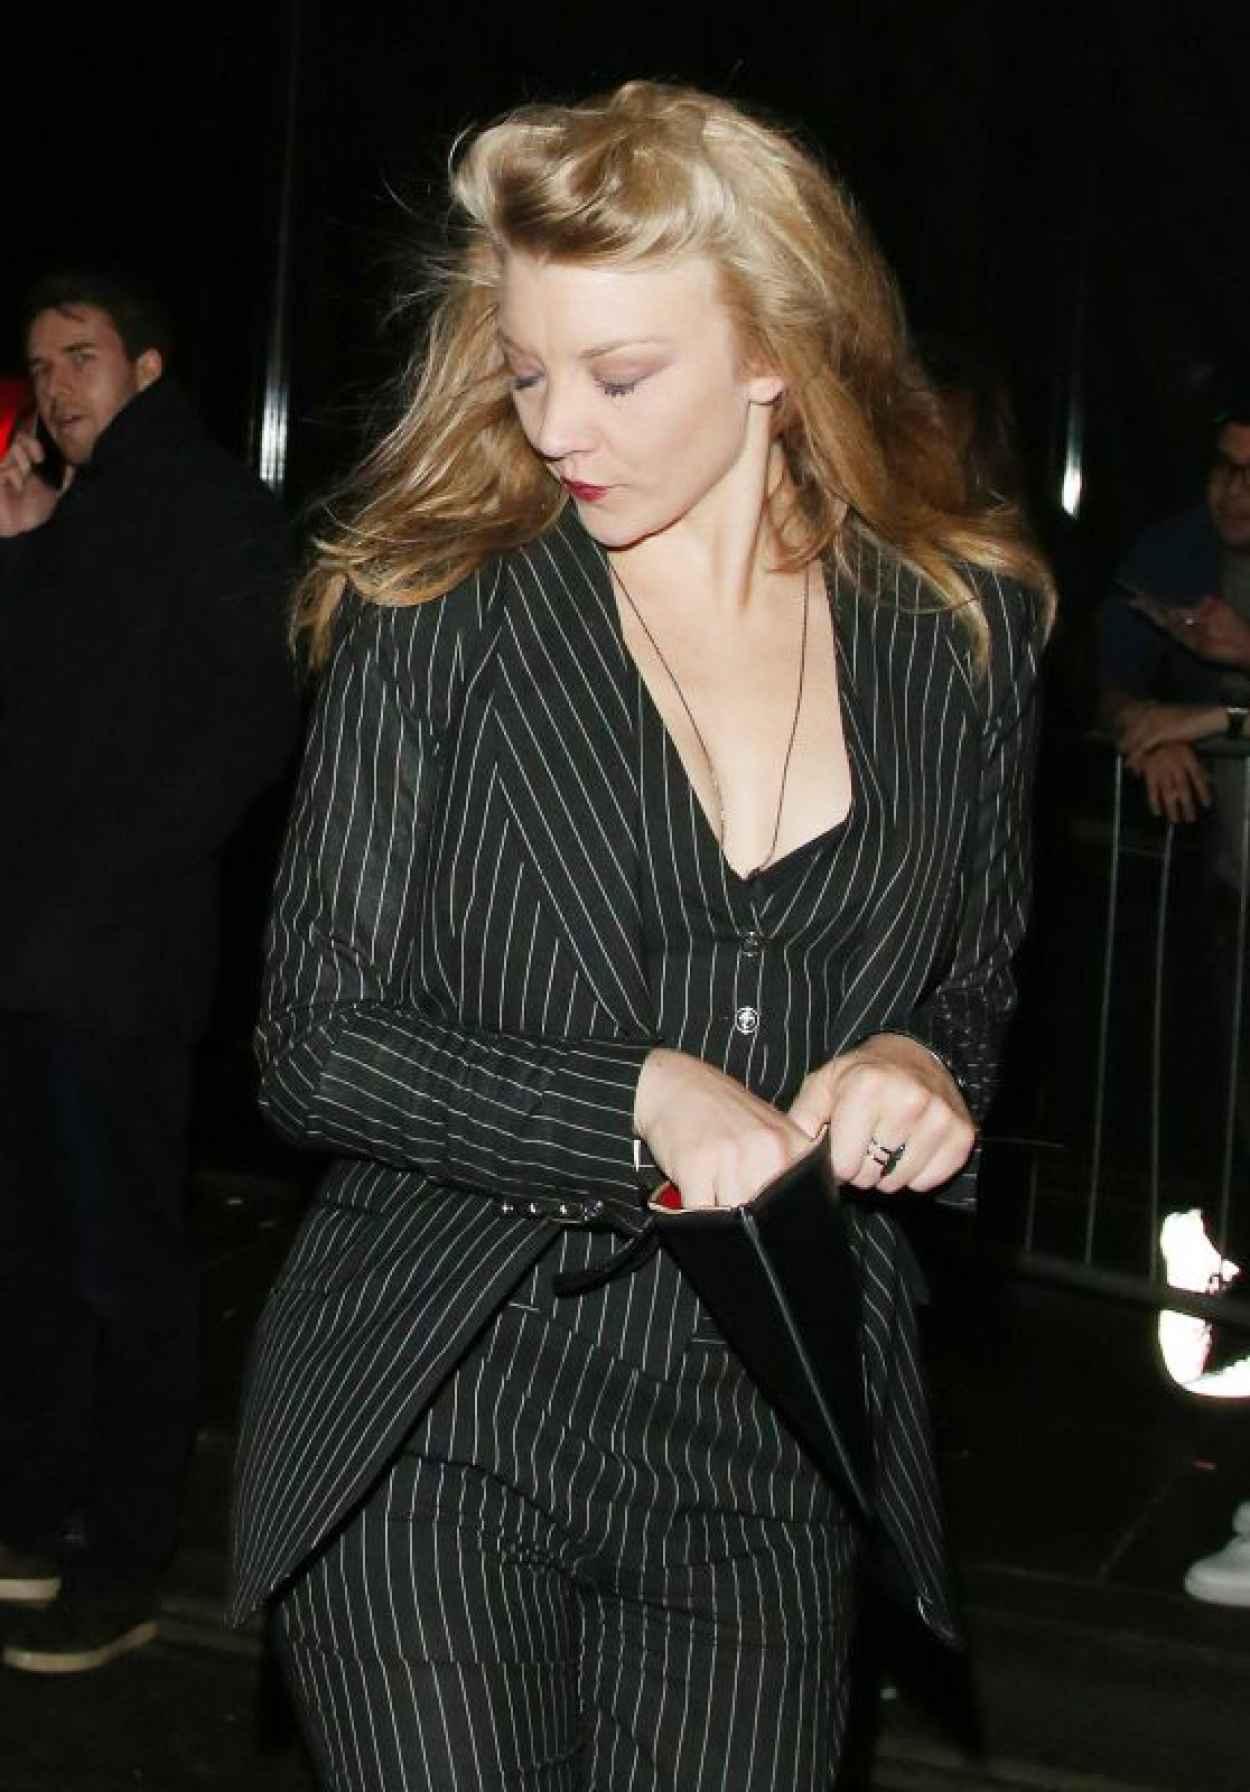 Natalie Dormer - Leaving a Hotel in London, October 2015-1